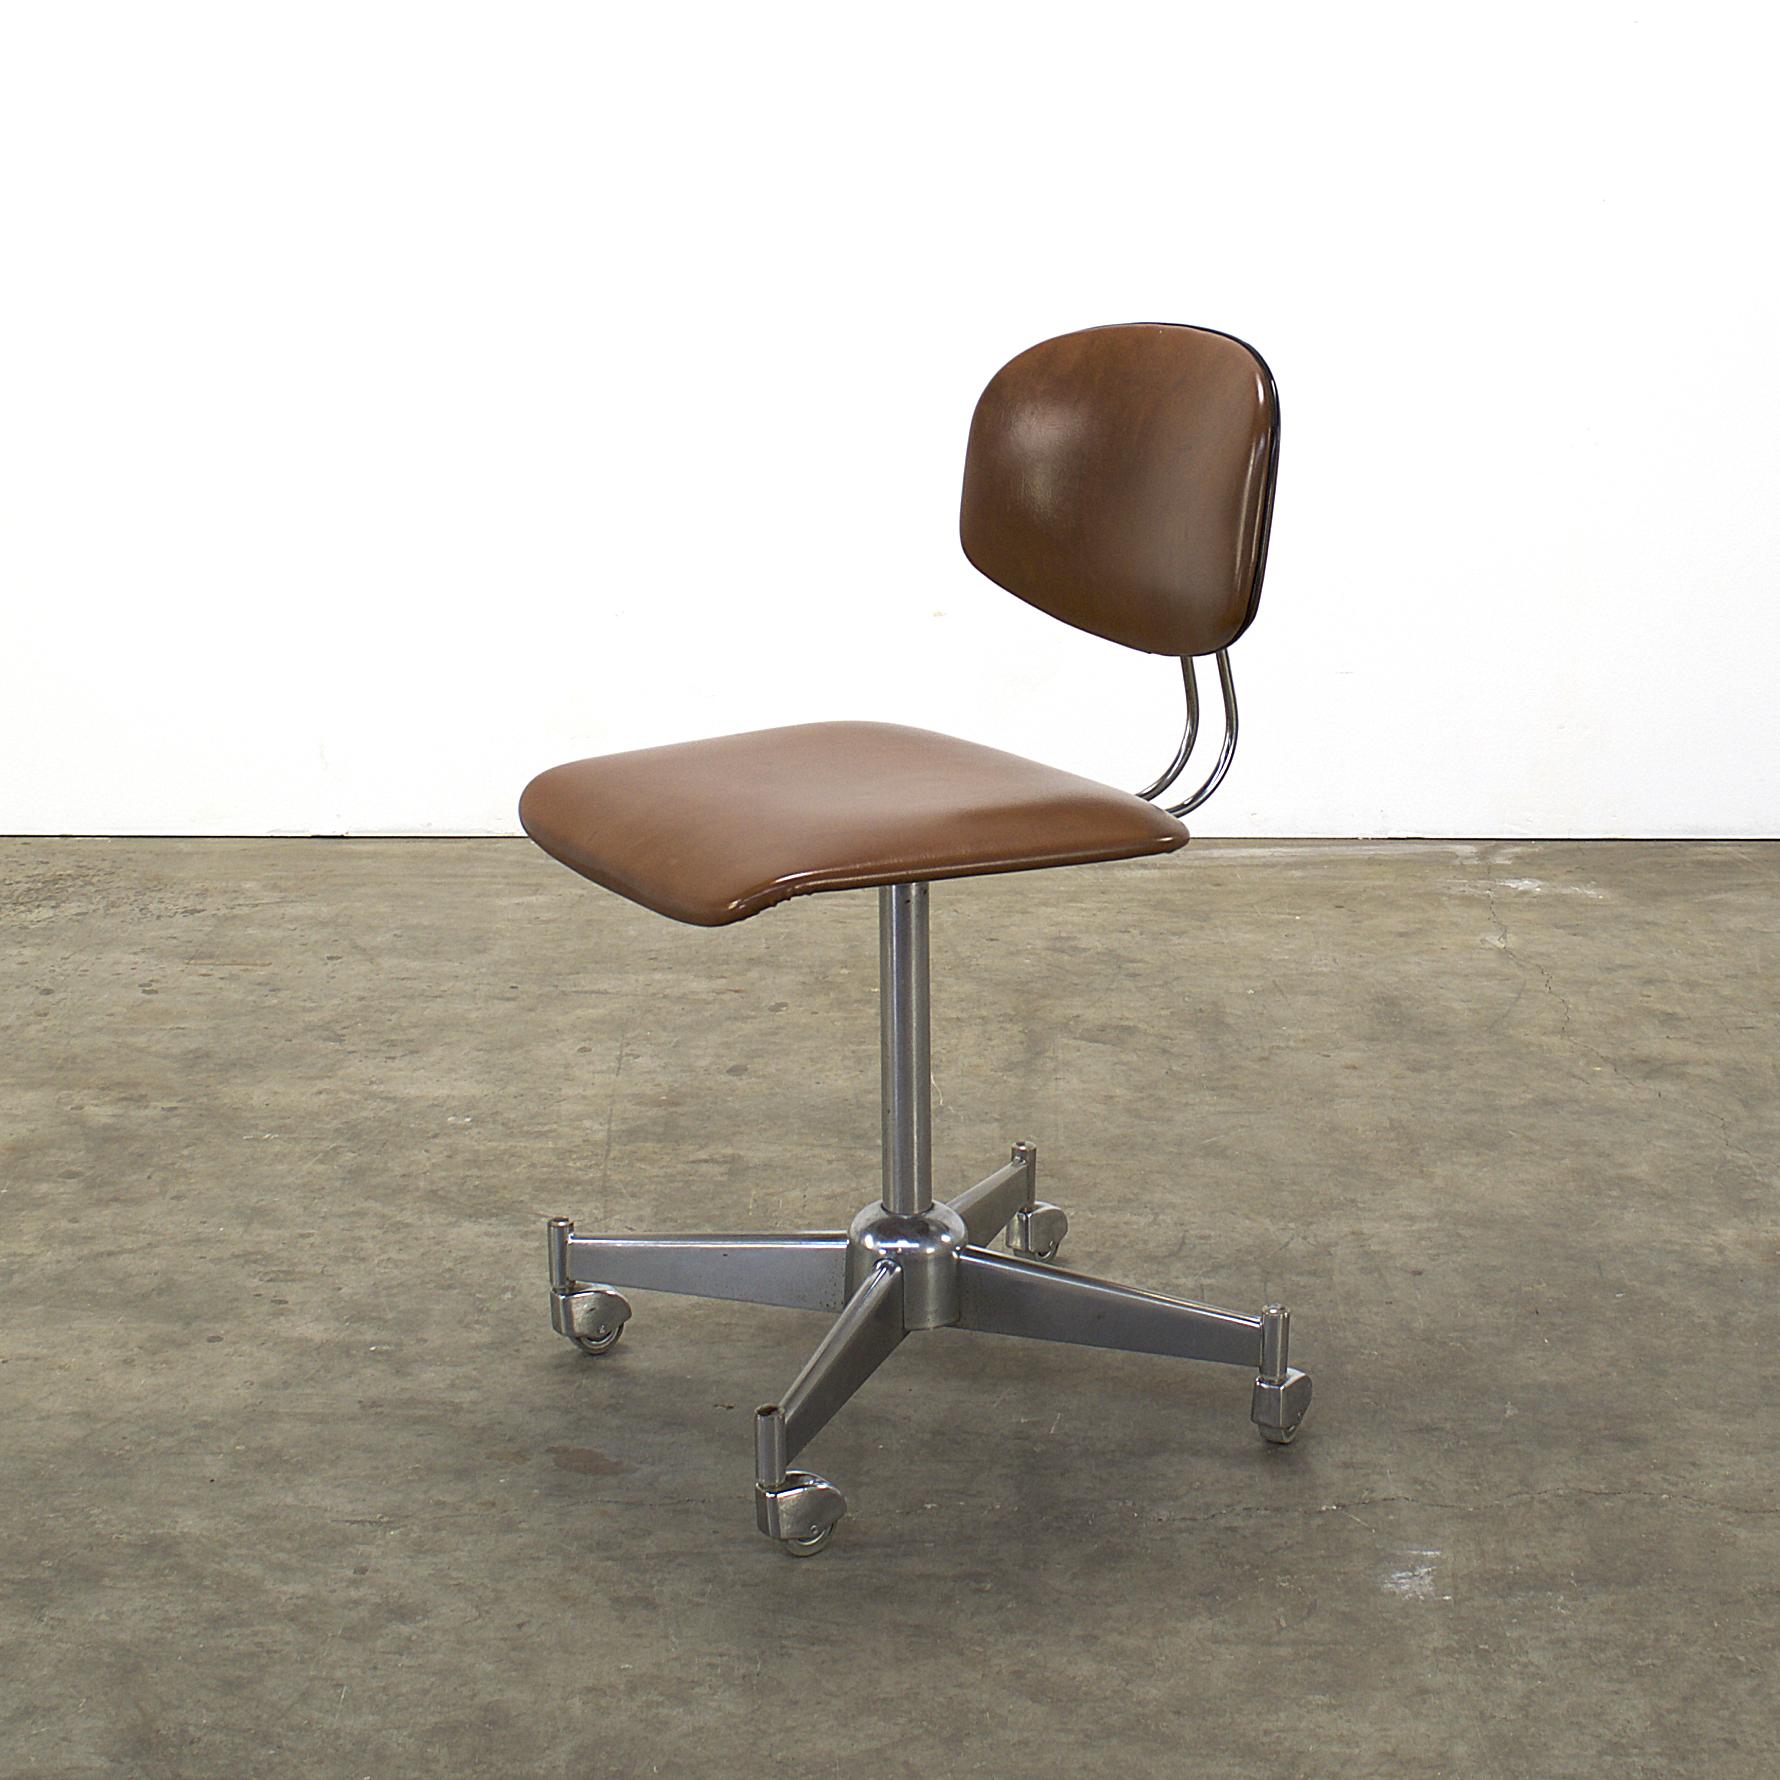 70 s office swivel chair adjustable heigth barbmama for Bureaustoel vintage